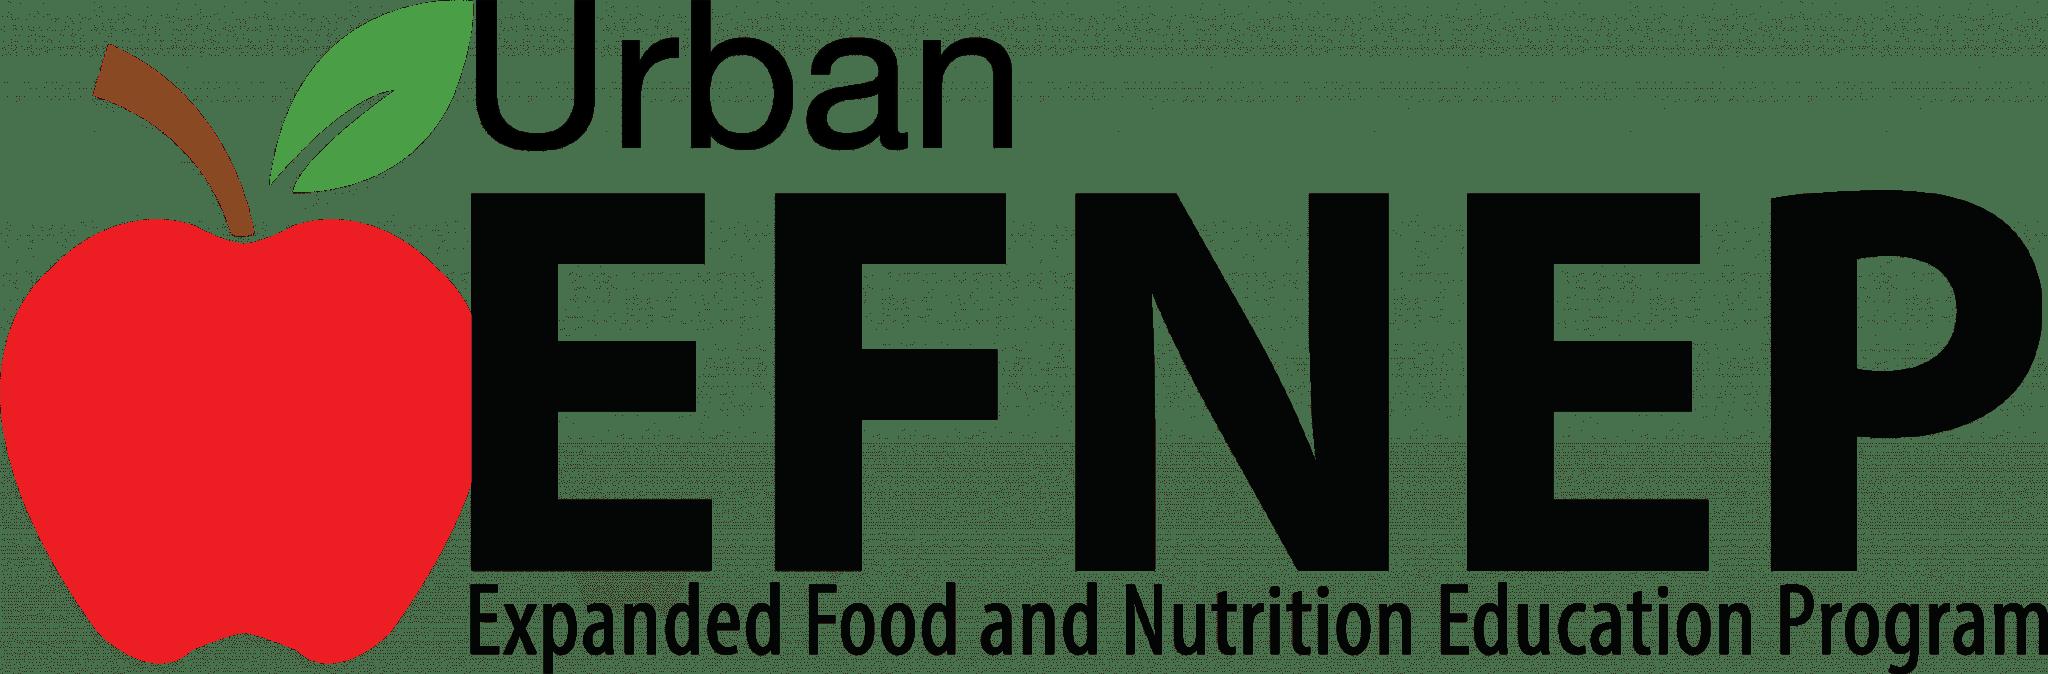 Urban EFNEP logo